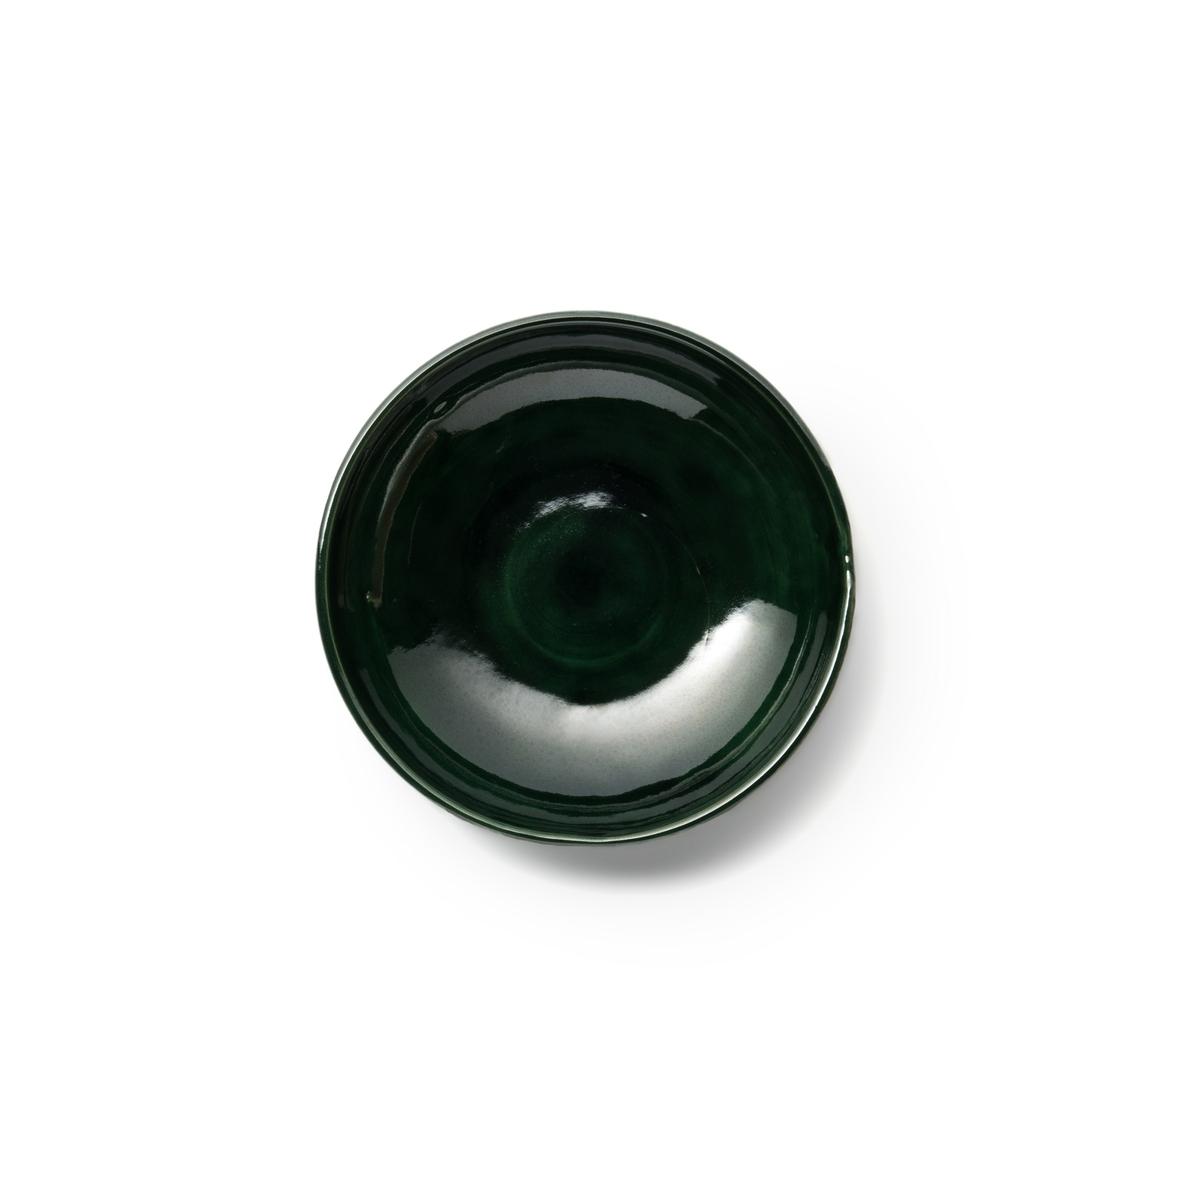 Ariana Speckled Bowl, Diameter 20cm